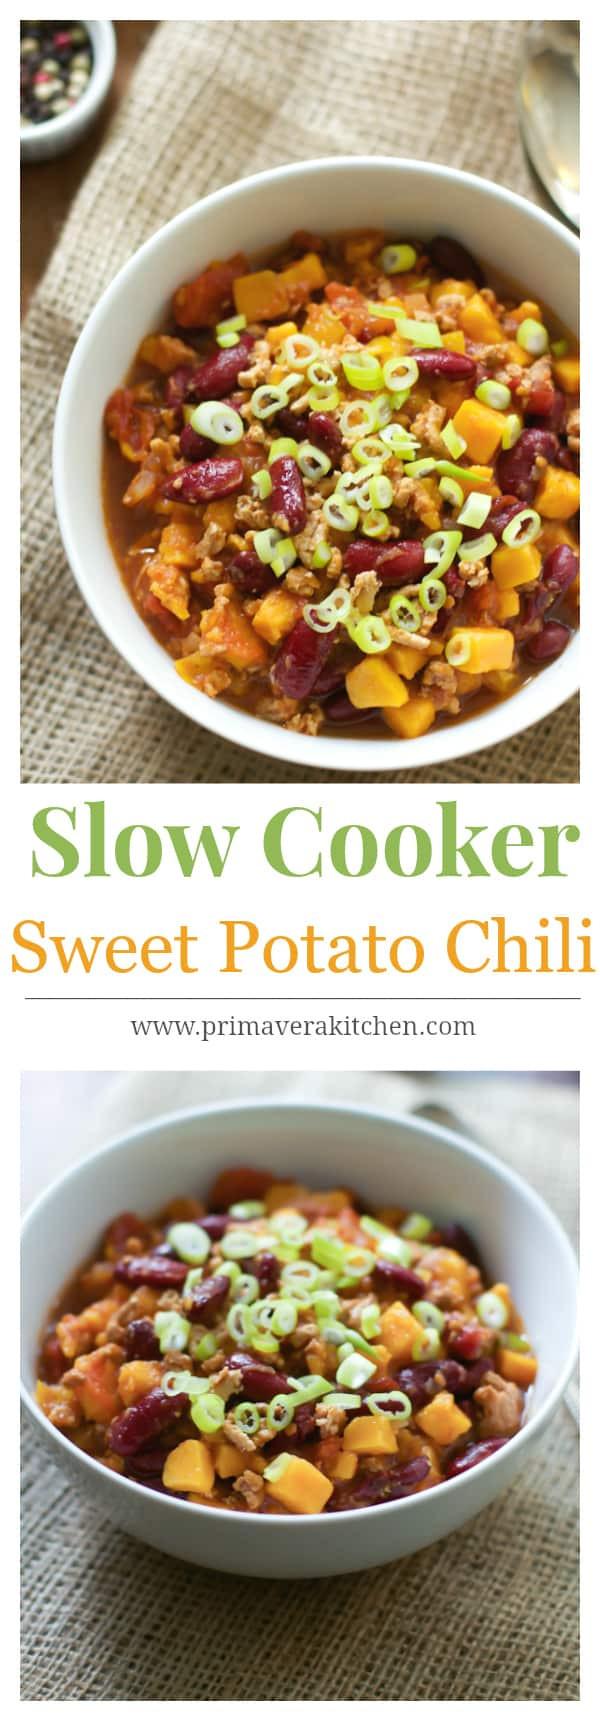 Sweet Potato Chili Slow Cooker  Slow Cooker Sweet Potato Chili Primavera Kitchen